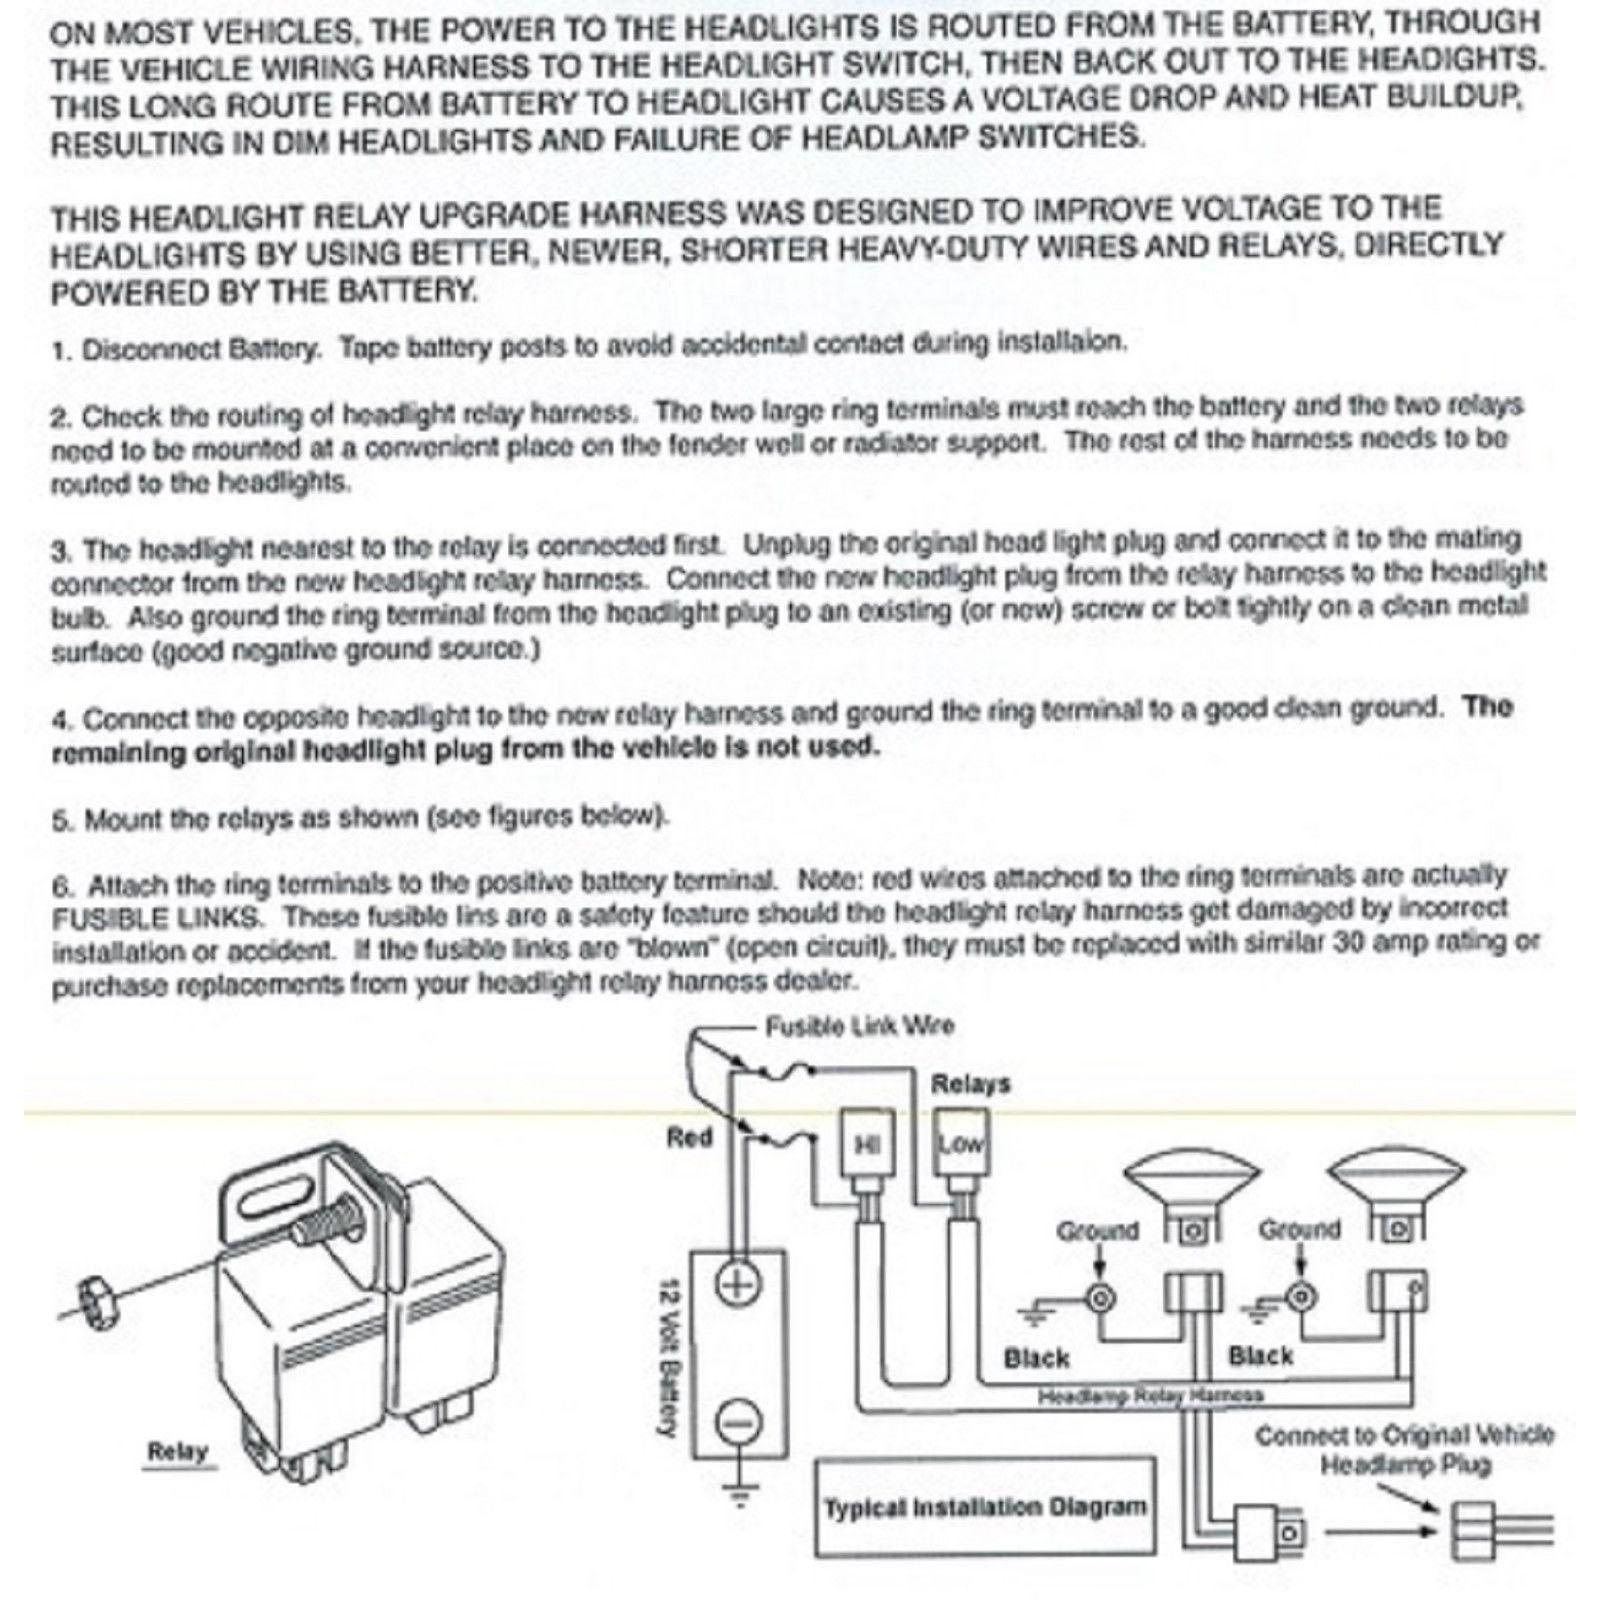 hight resolution of ceramic h4 headlight relay wiring harness 2 headlamp light bulb socket plugs 7